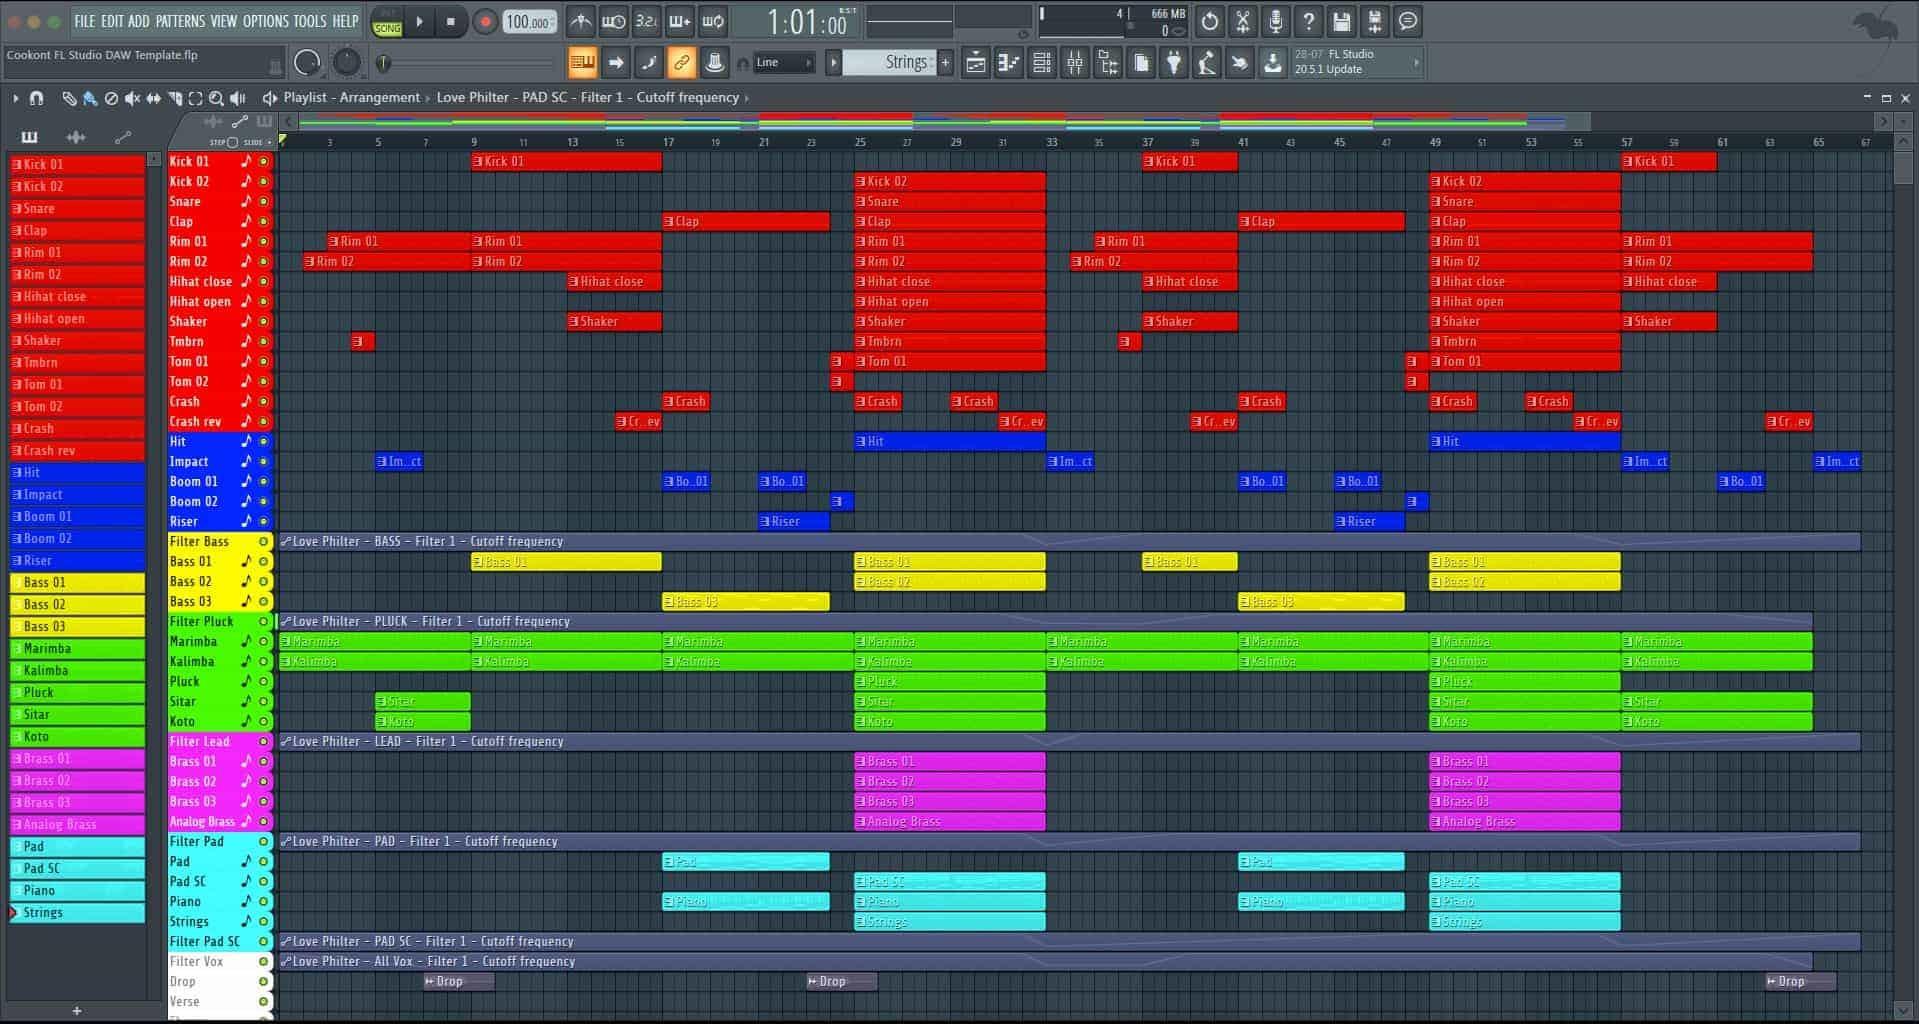 Cookont FL Studio DAW Template